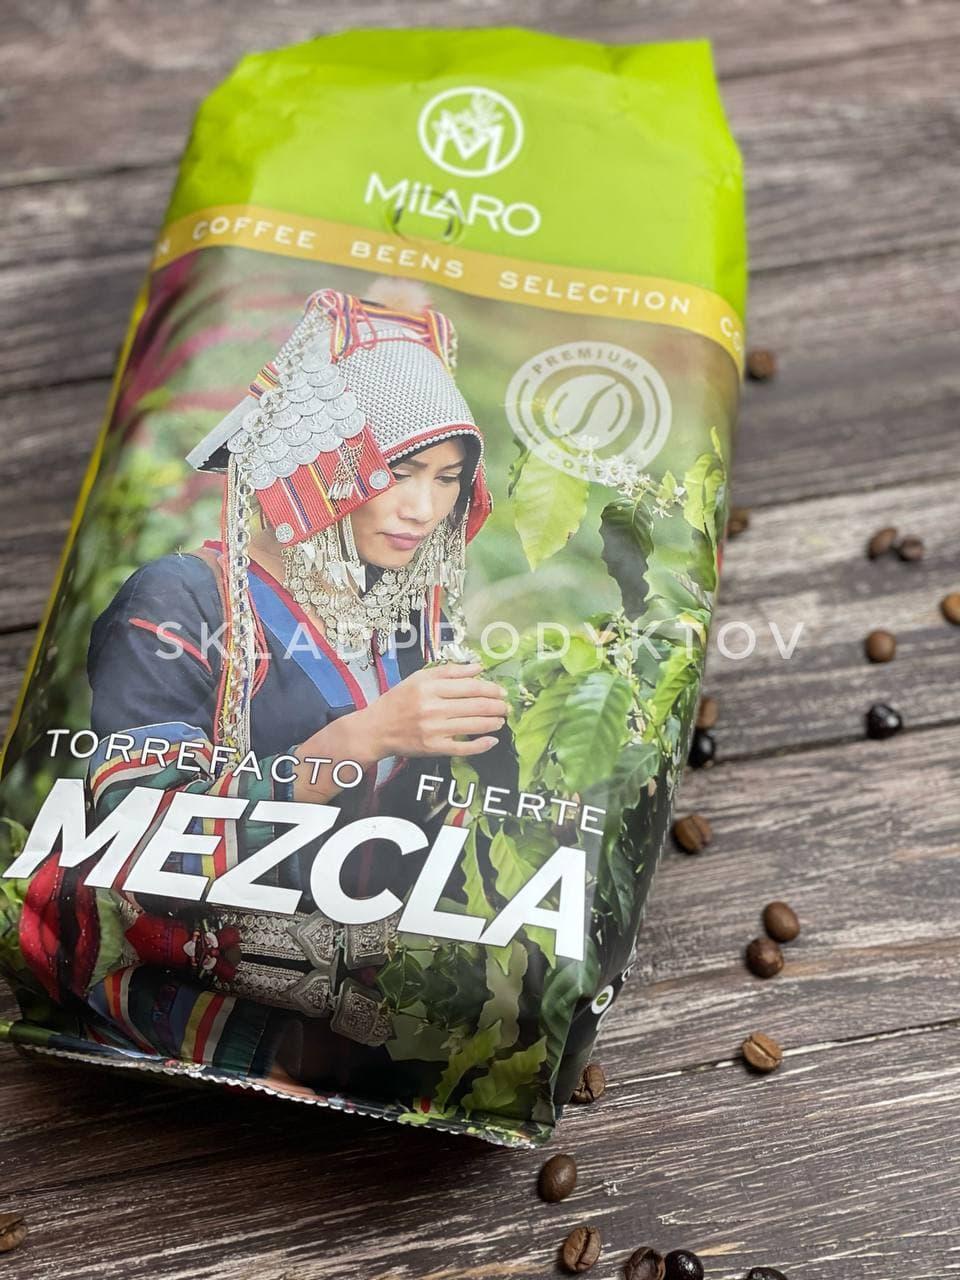 Кофе в зернах Milaro MEZCLA 1кг, 100% арабика Испания